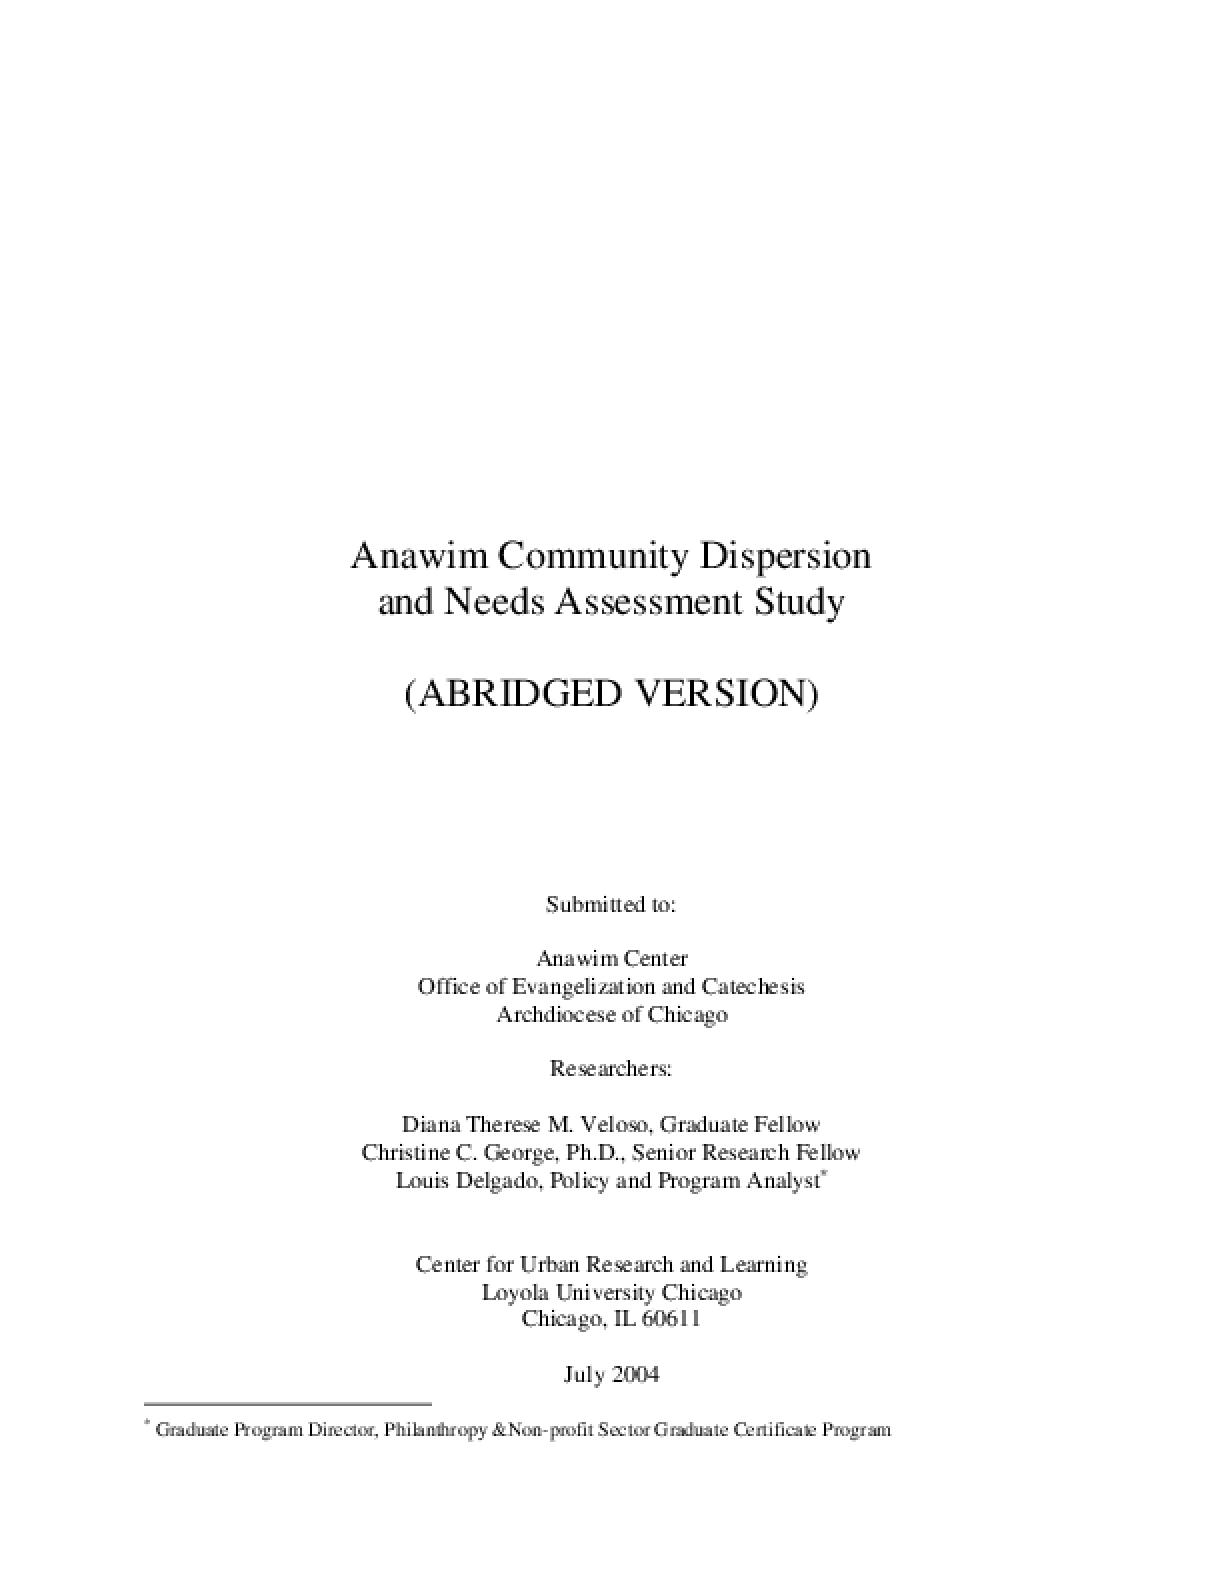 Anawim Community Dispersion and Needs Assessment Study (Abridged Version))